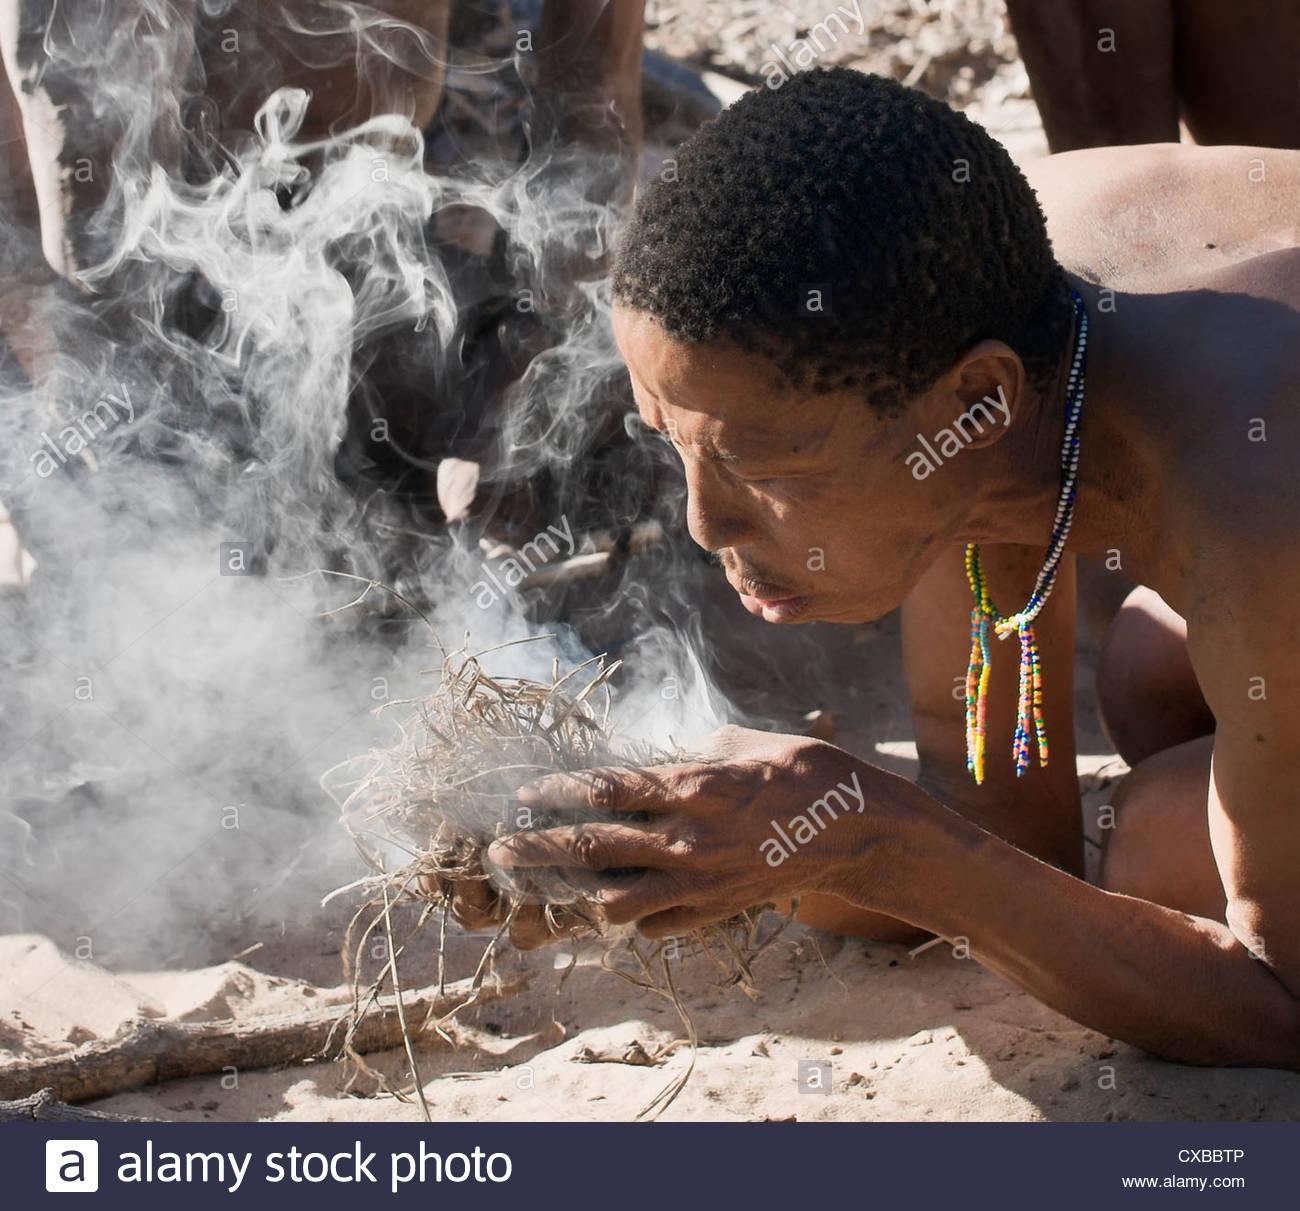 Jul'hoan !Kung Bushmen starting a fire using friction, Bushmanland, Kalahari Desert, Namibia, Africa - Stock Image